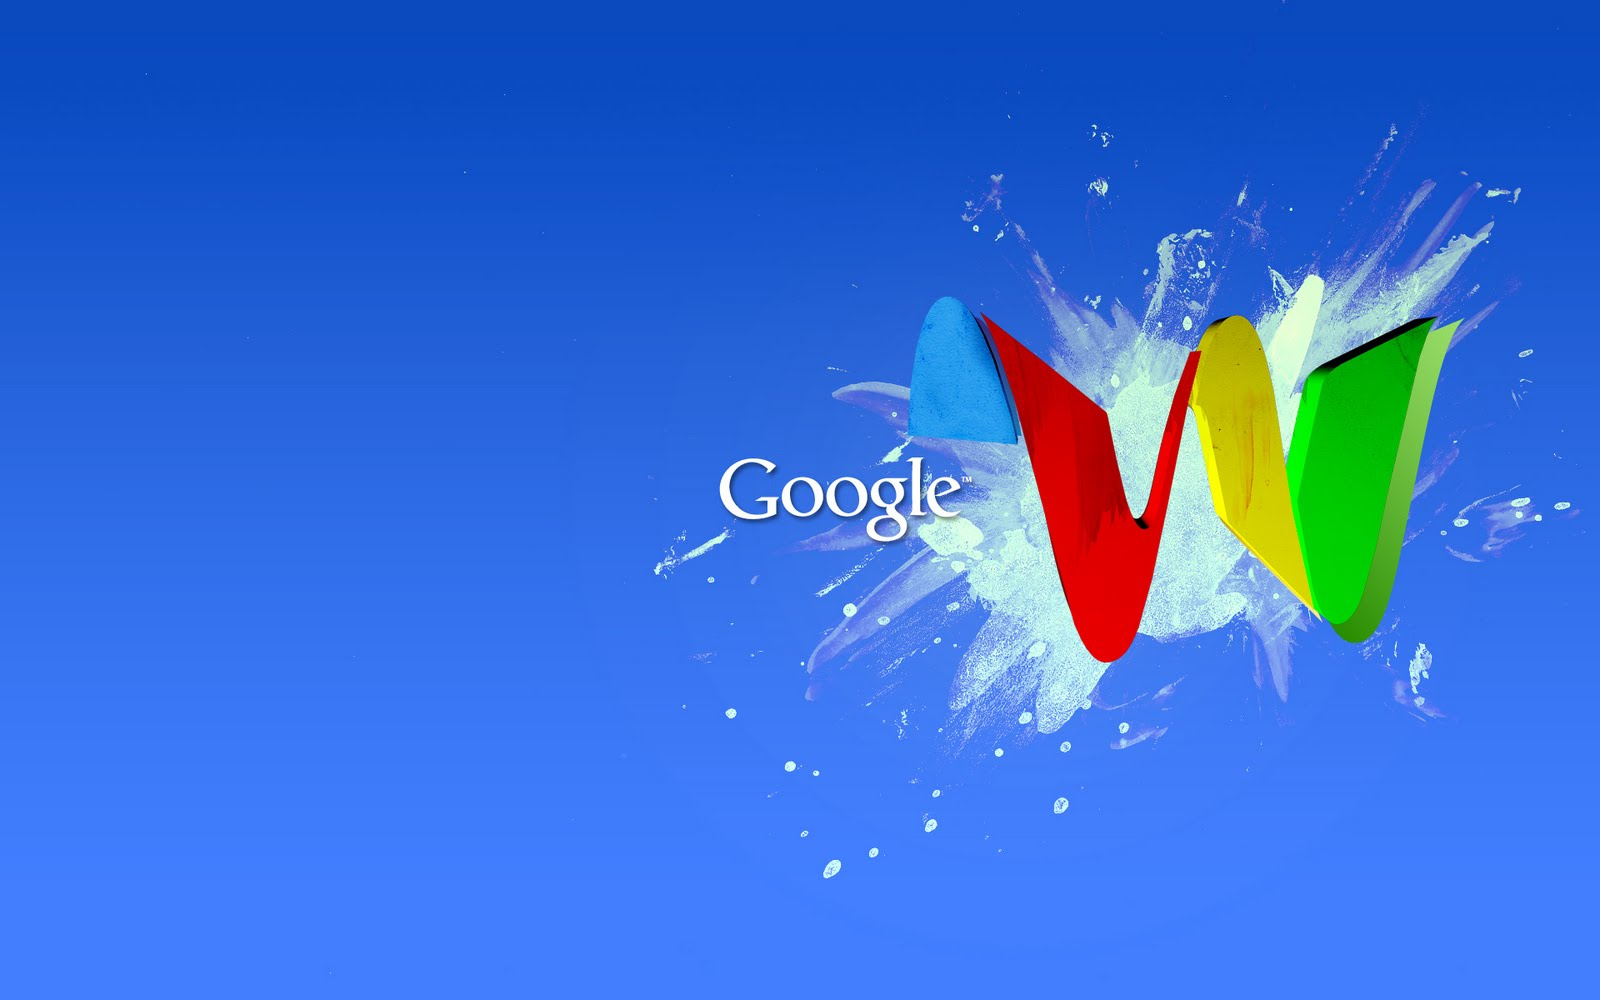 http://1.bp.blogspot.com/-PW8wOj-QNqs/Te9MGRZT15I/AAAAAAAAIWA/kkWdFKgdN7Y/s1600/Google-achtergronden-hd-google-wallpapers-afbeelding-3.jpg